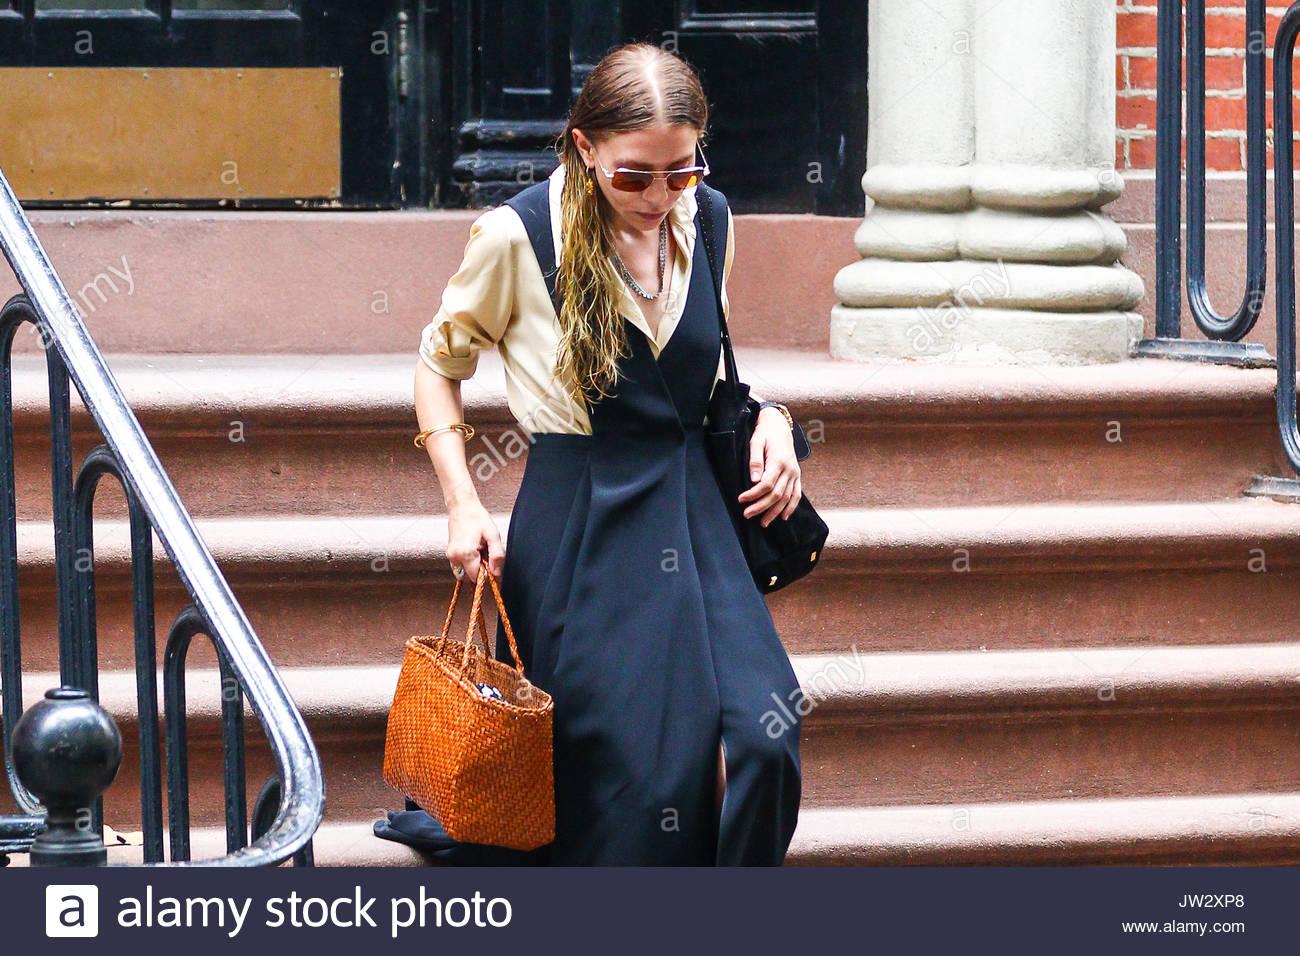 Ashley Olsen is seen leaving her apartment in NYC. Ashley Olsen ...